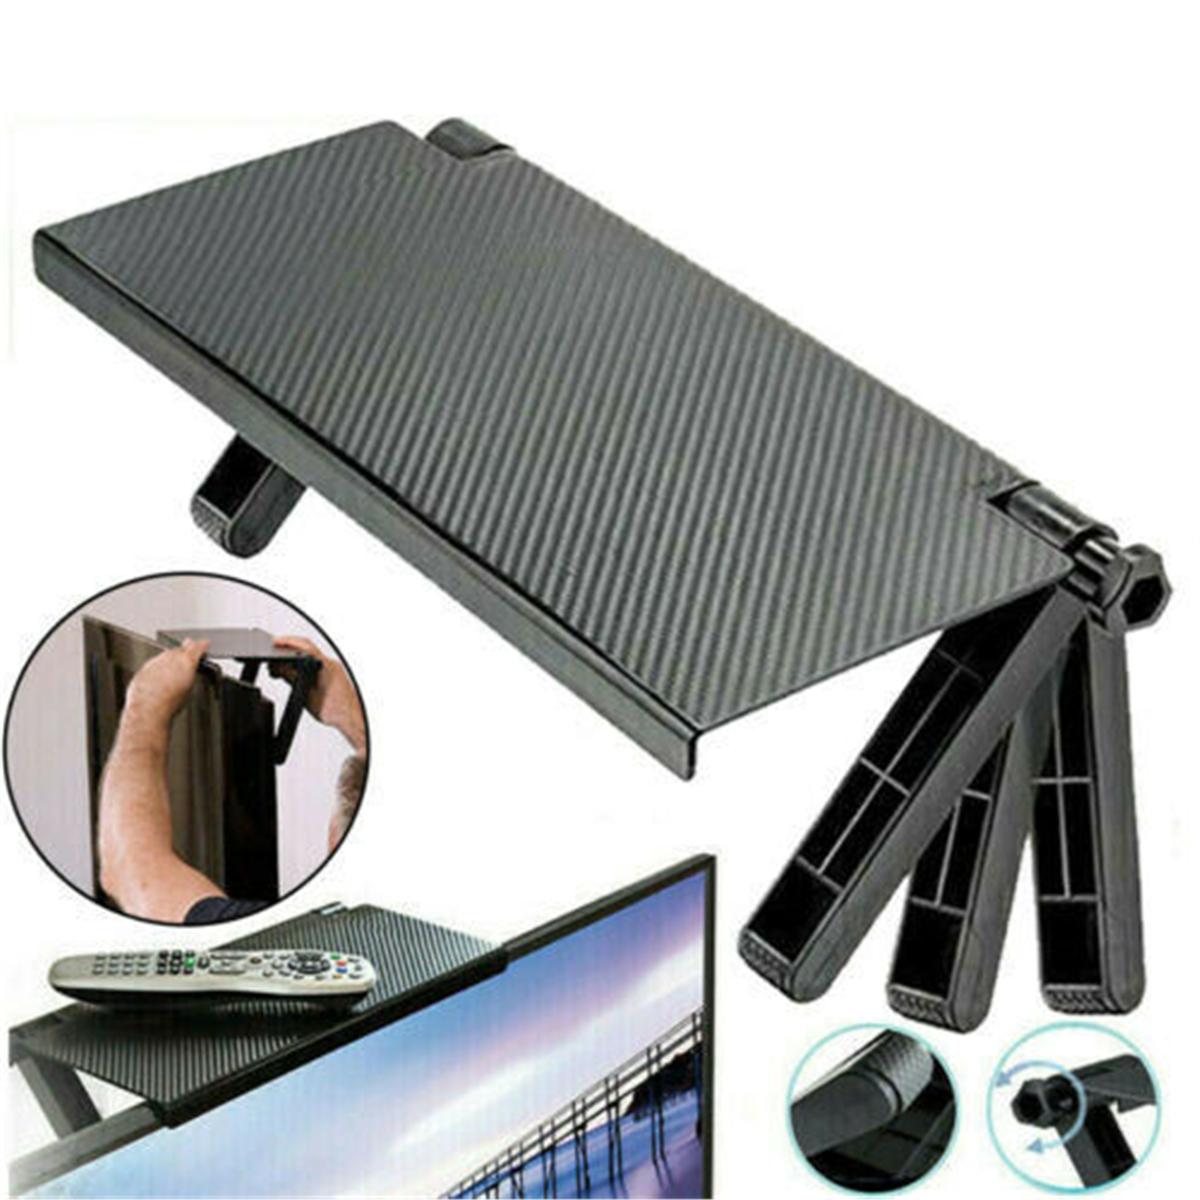 Screen Caddy Screen TOP Shelf Desktop Storage Rack Black Oraginal Adjustable